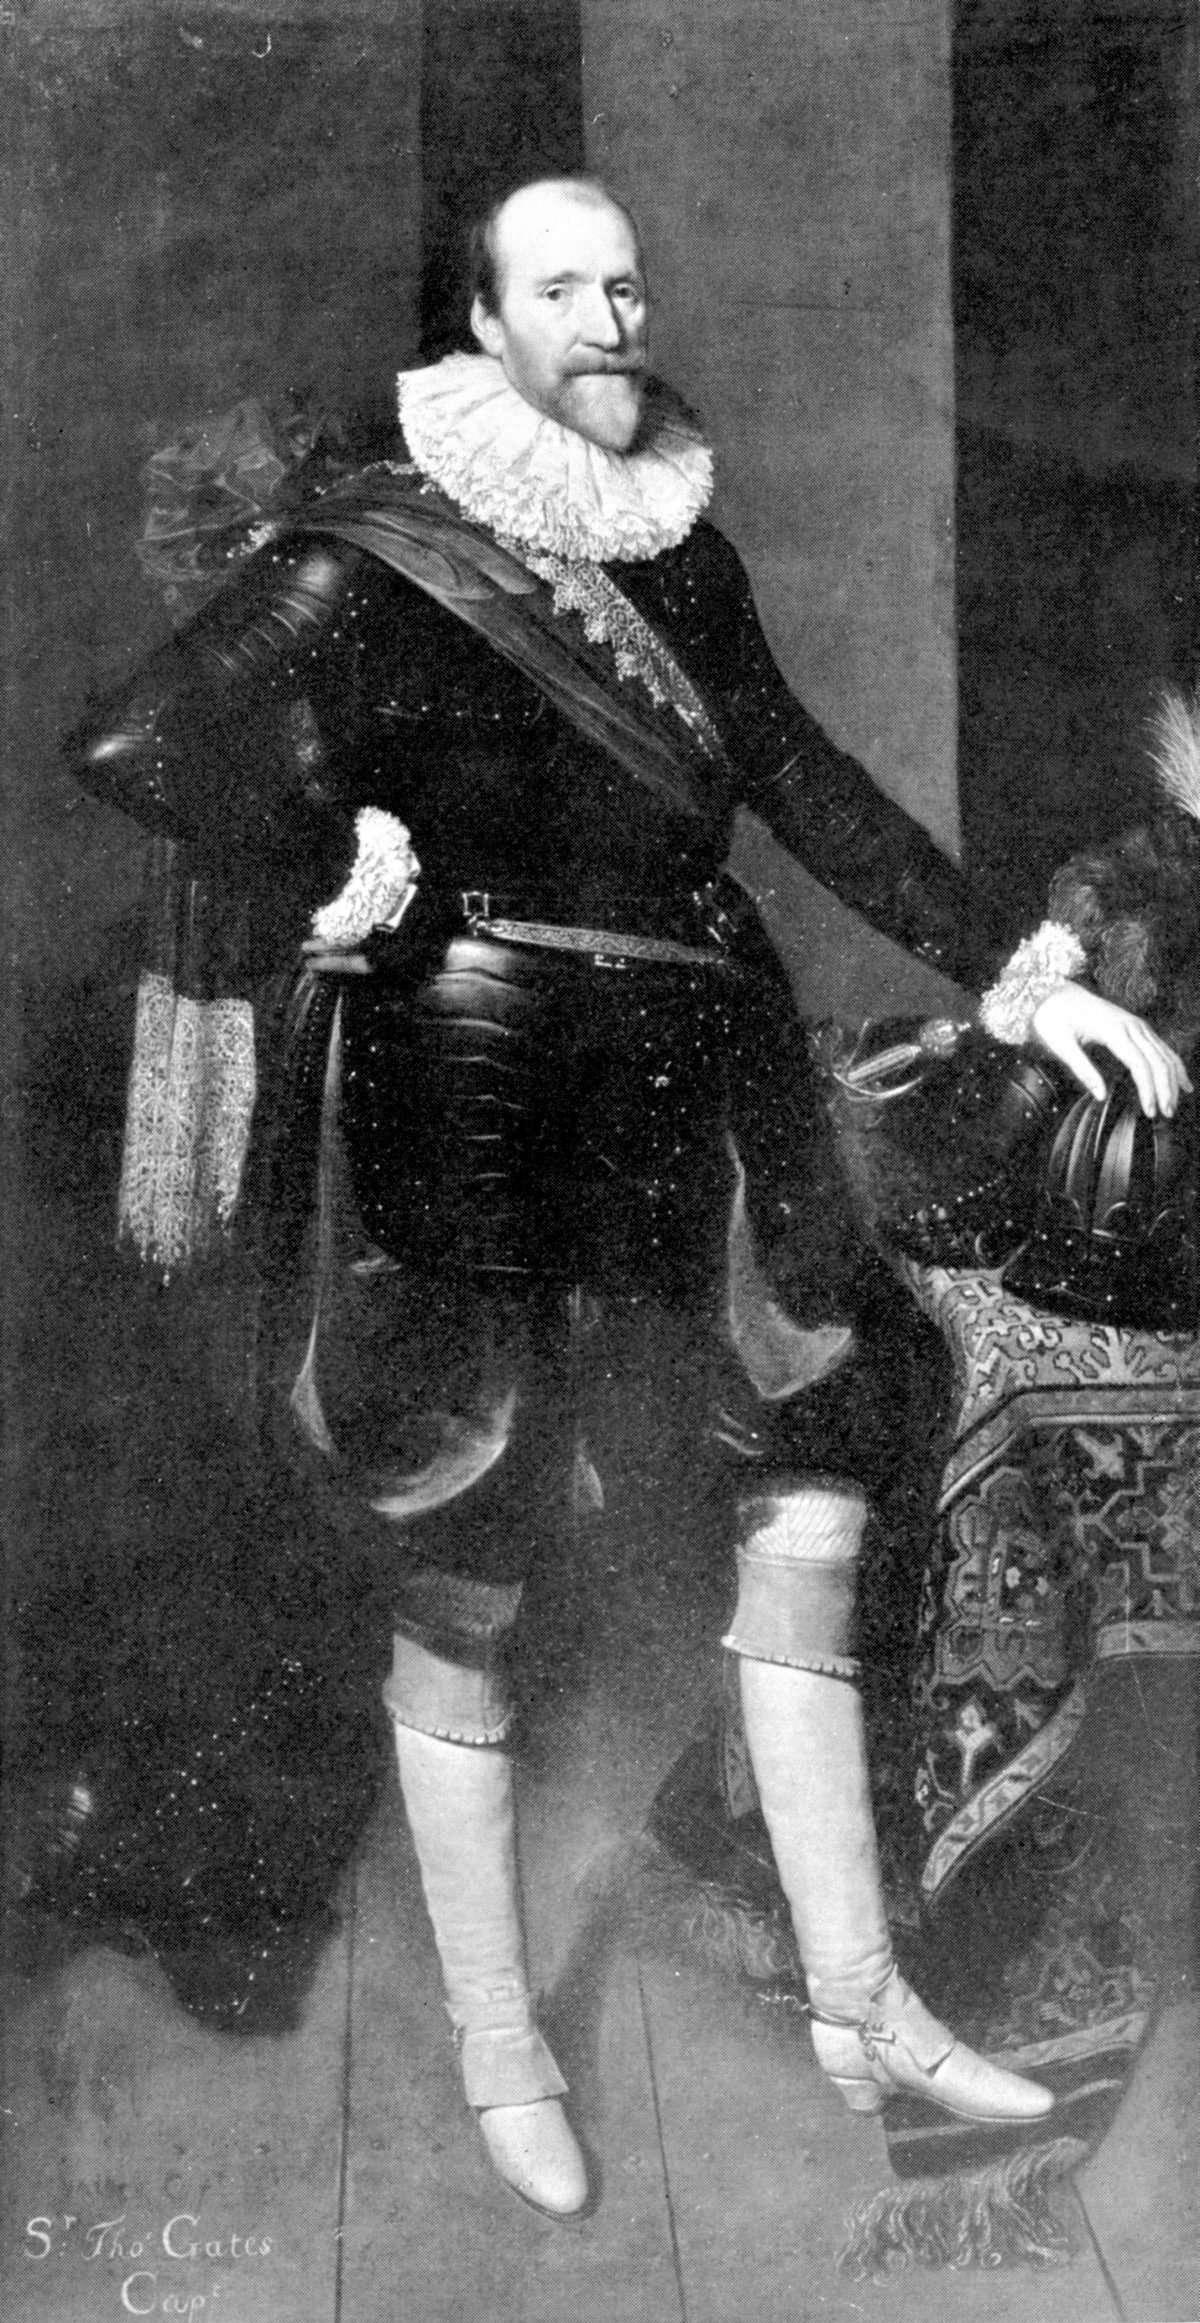 Sir Thomas Gates